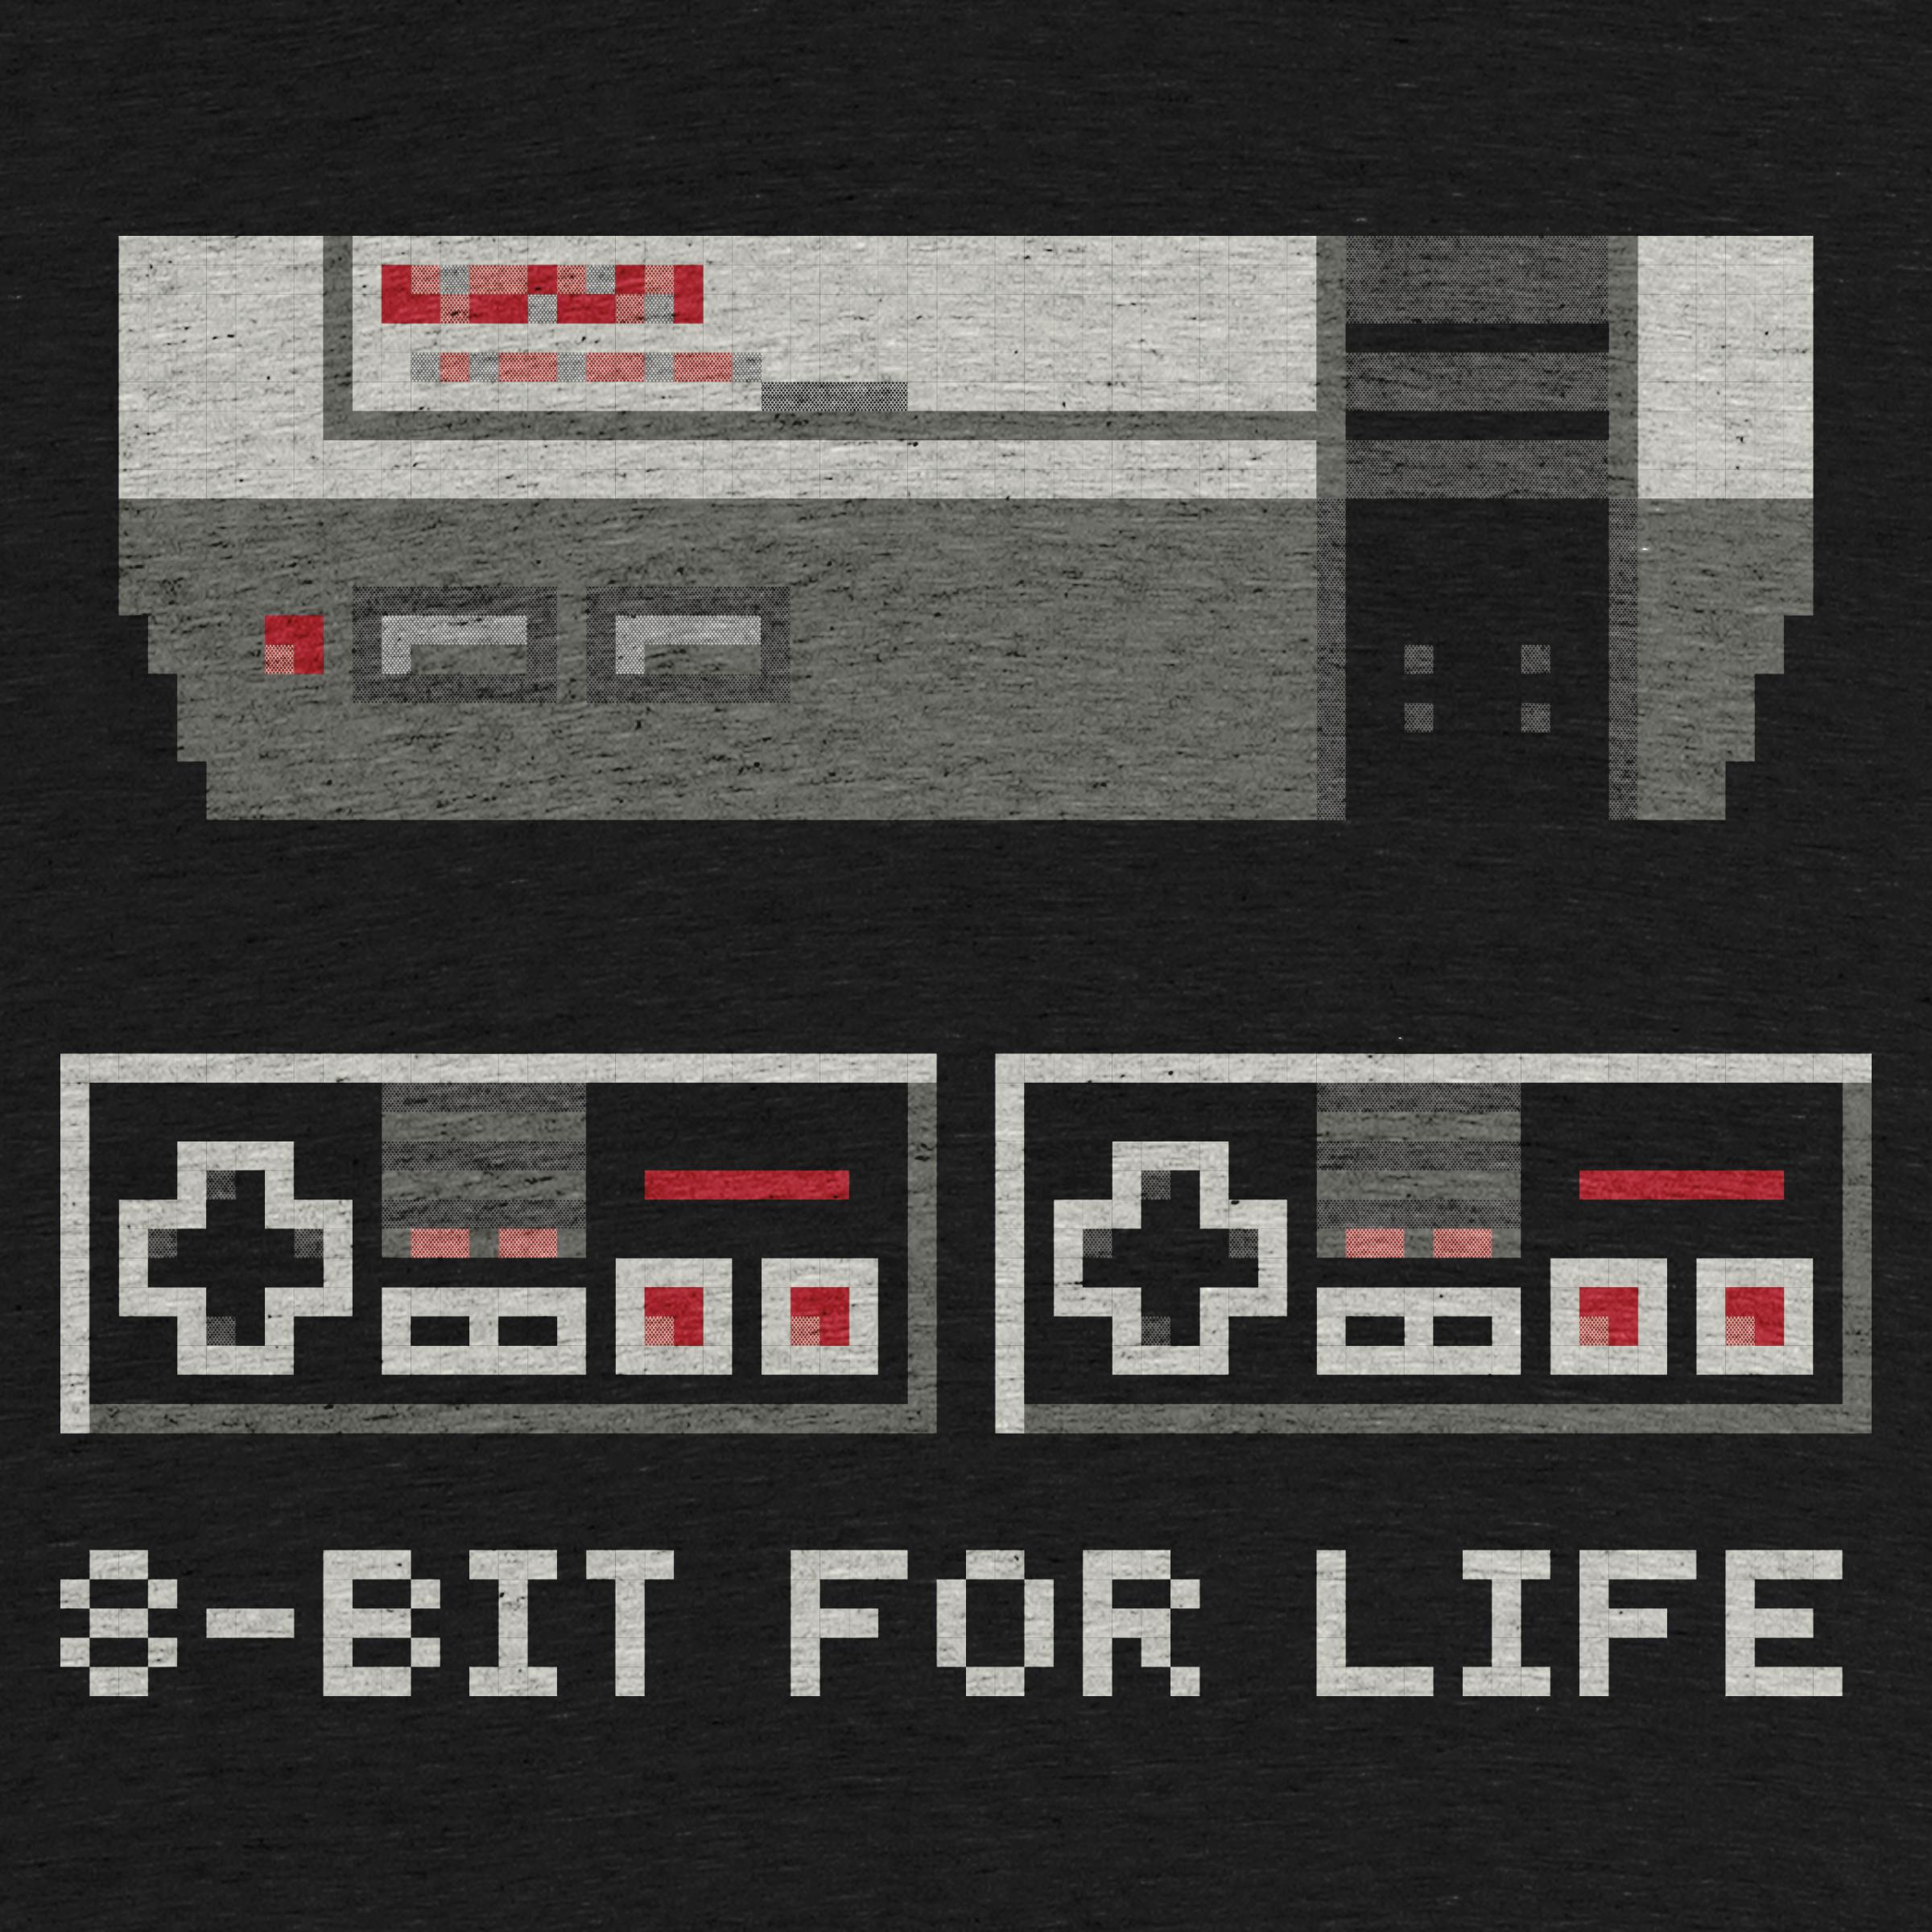 8-Bit for life